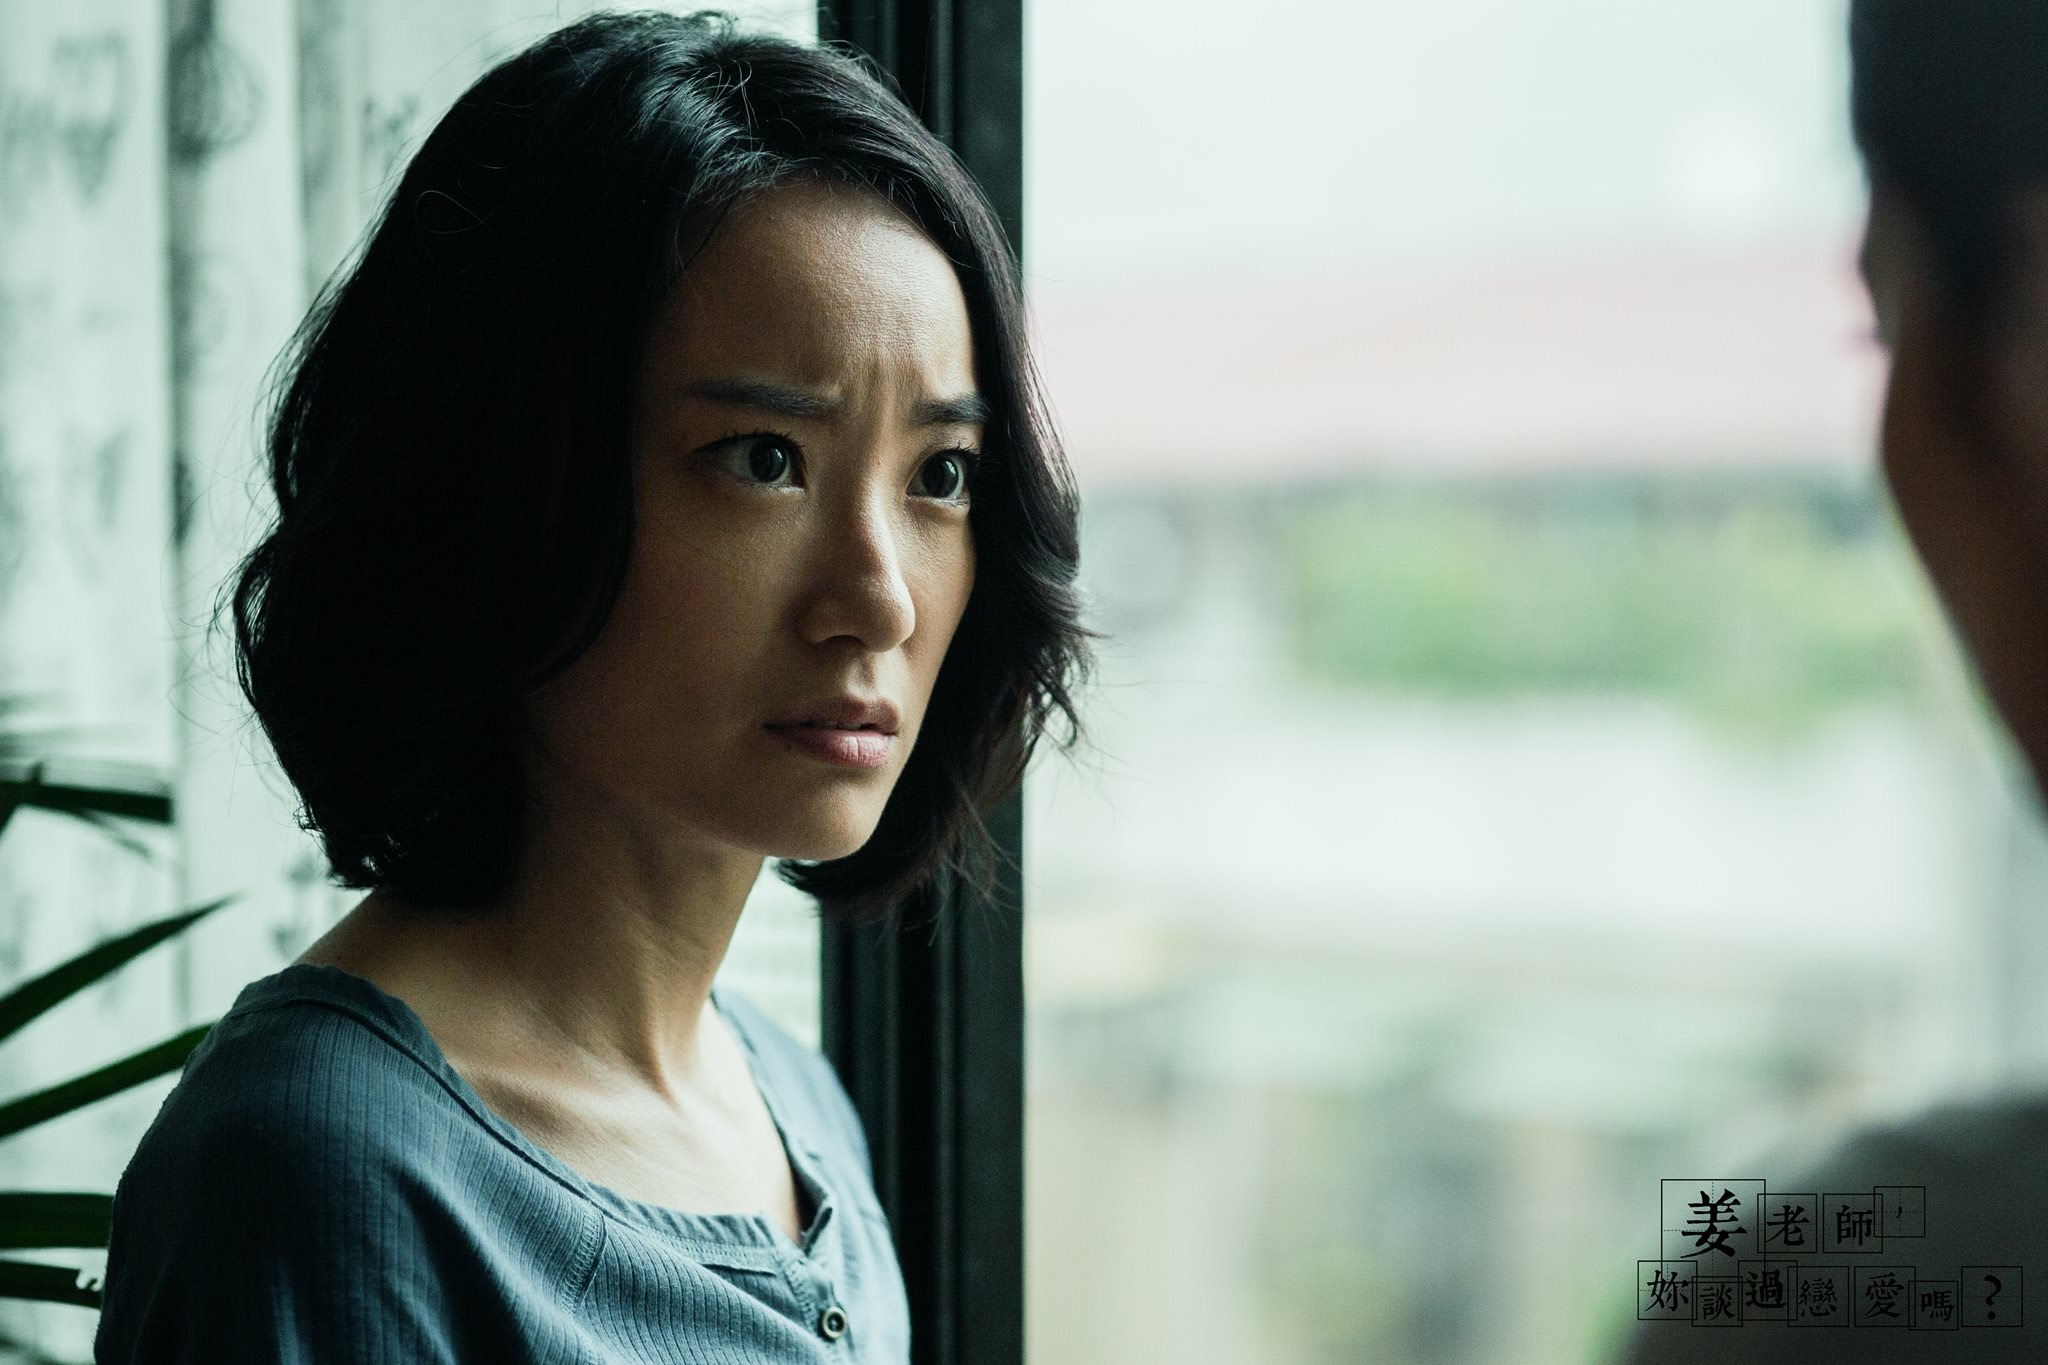 Yu-Chen He in Jiang Teacher, You Talked About Love It (2016)